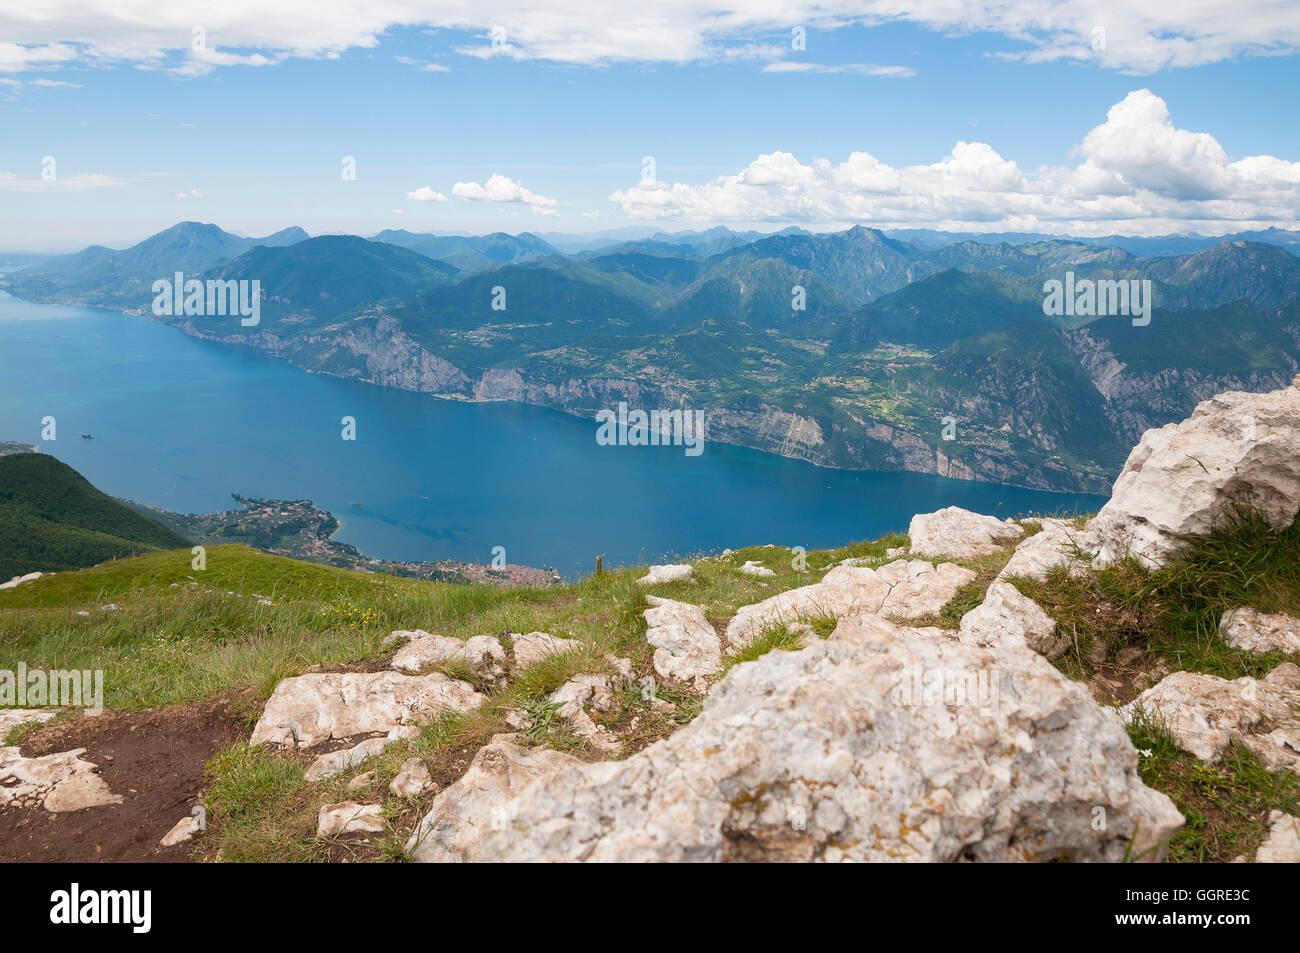 Landscape of Lago De Garda (Garda lake), North Italy - Stock Image